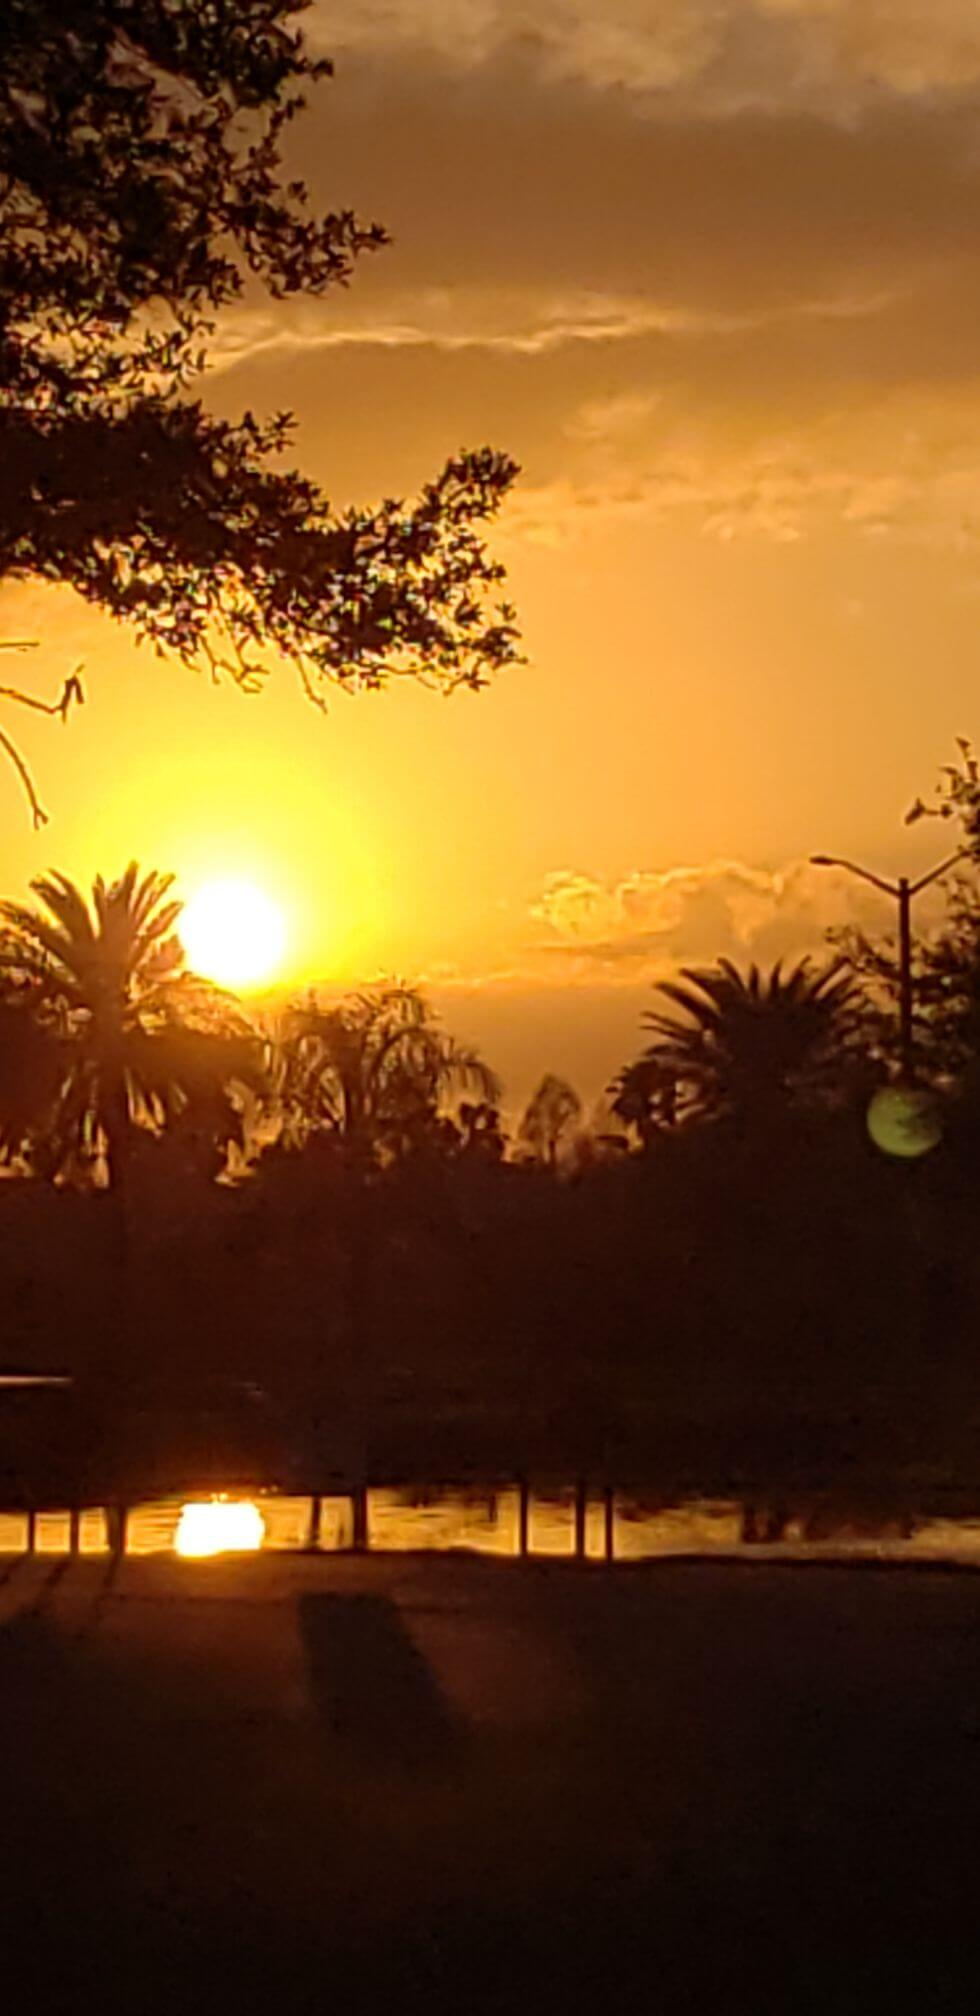 Kiwacz-Sunset